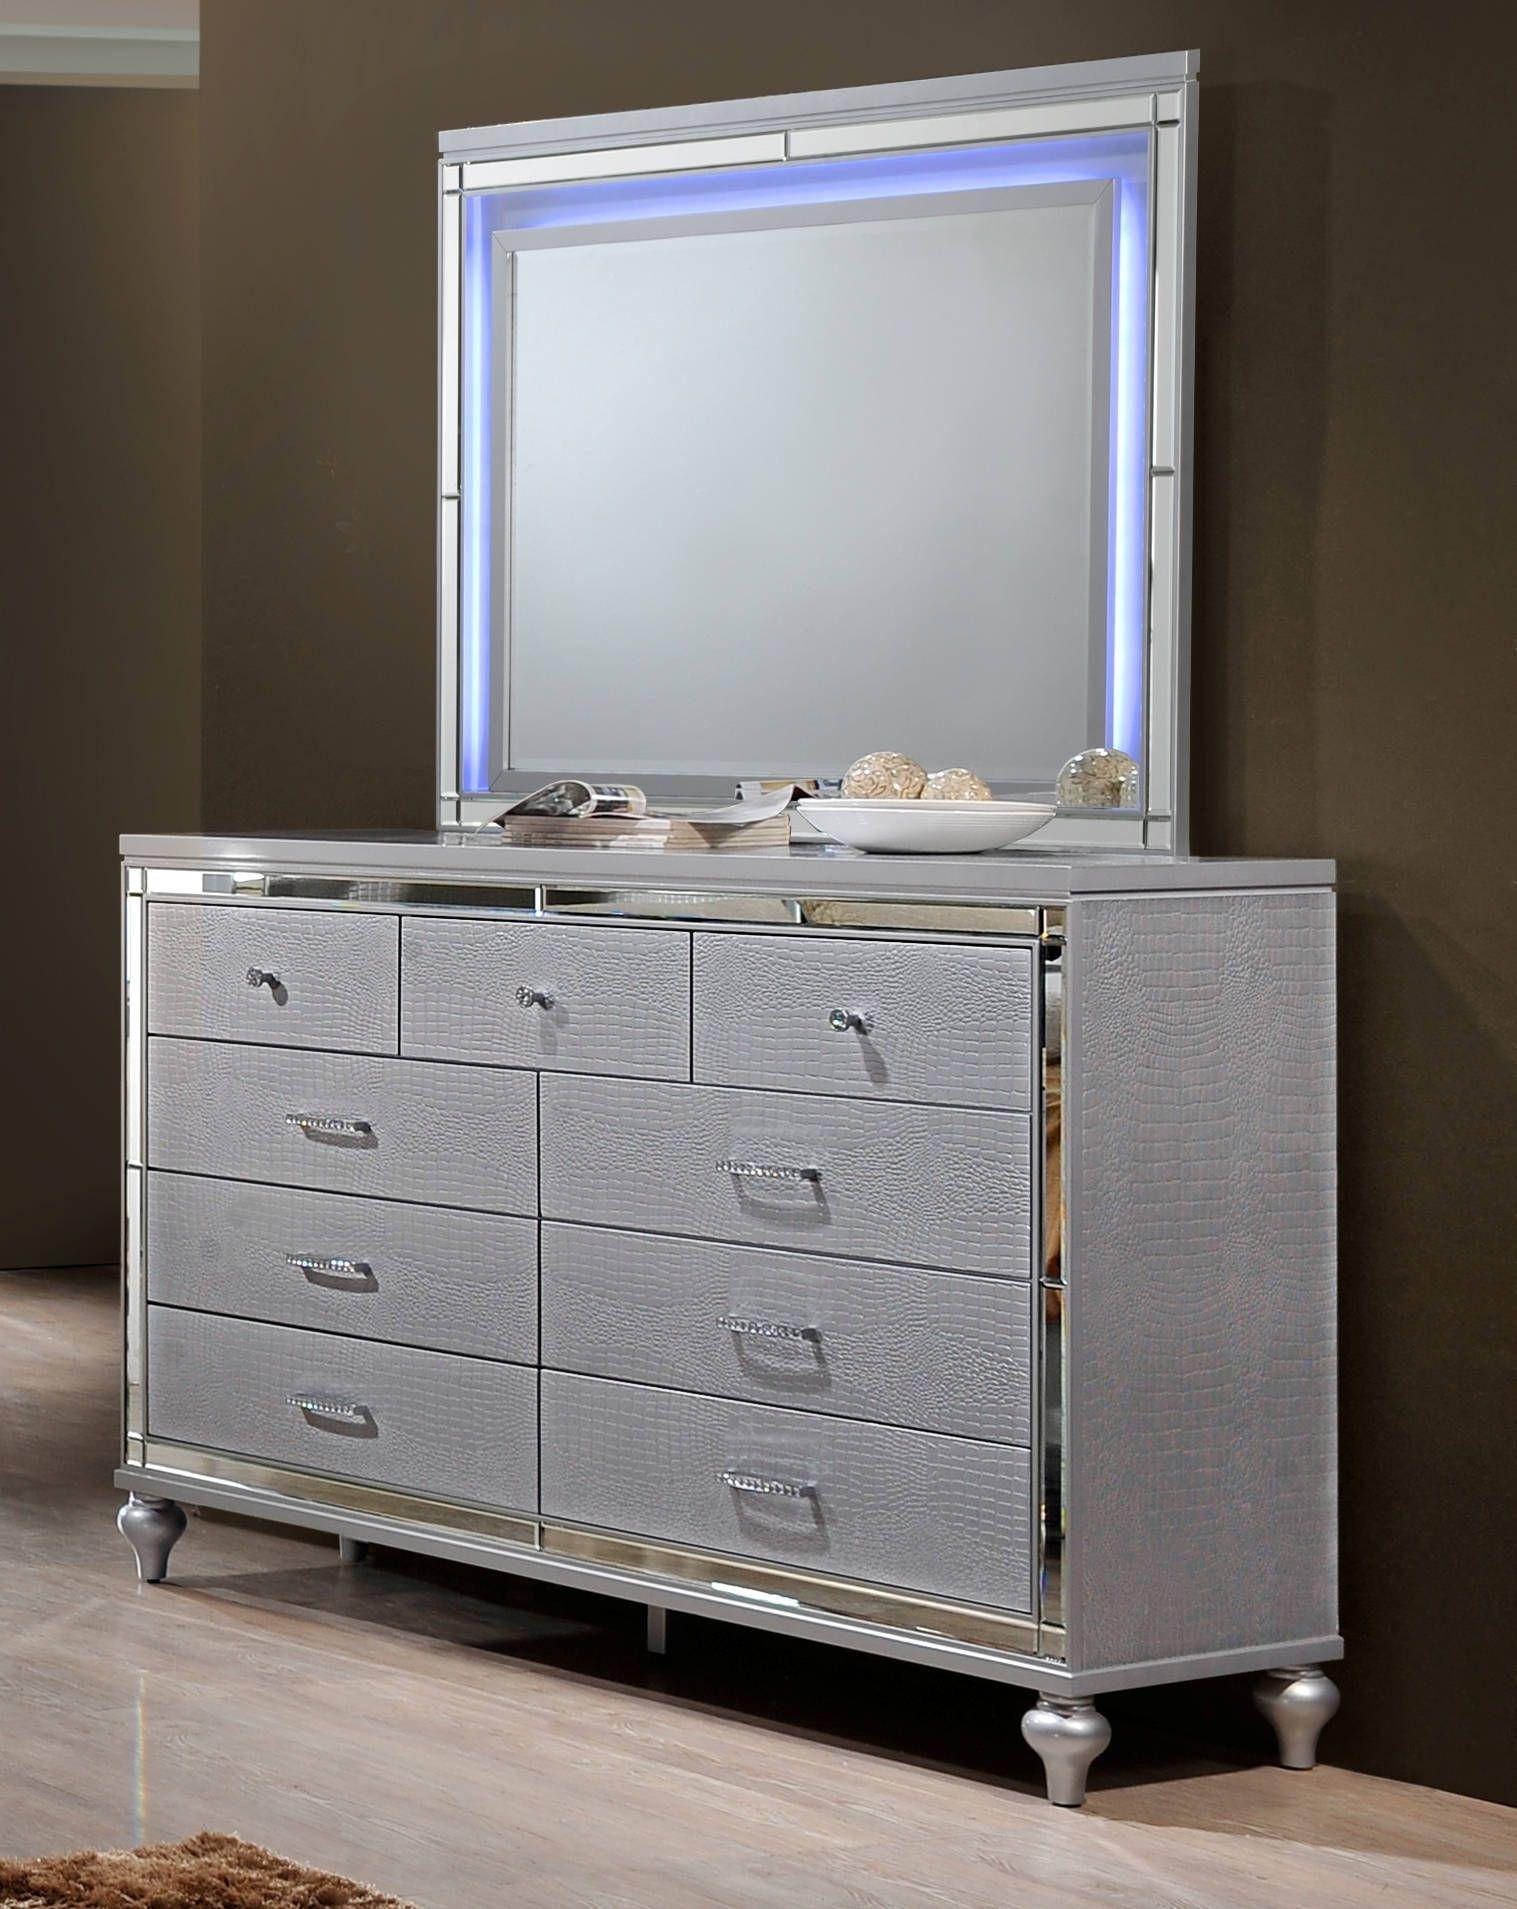 Valentino Silver Hardwood Solids Veneers 9 Drawers Dresser